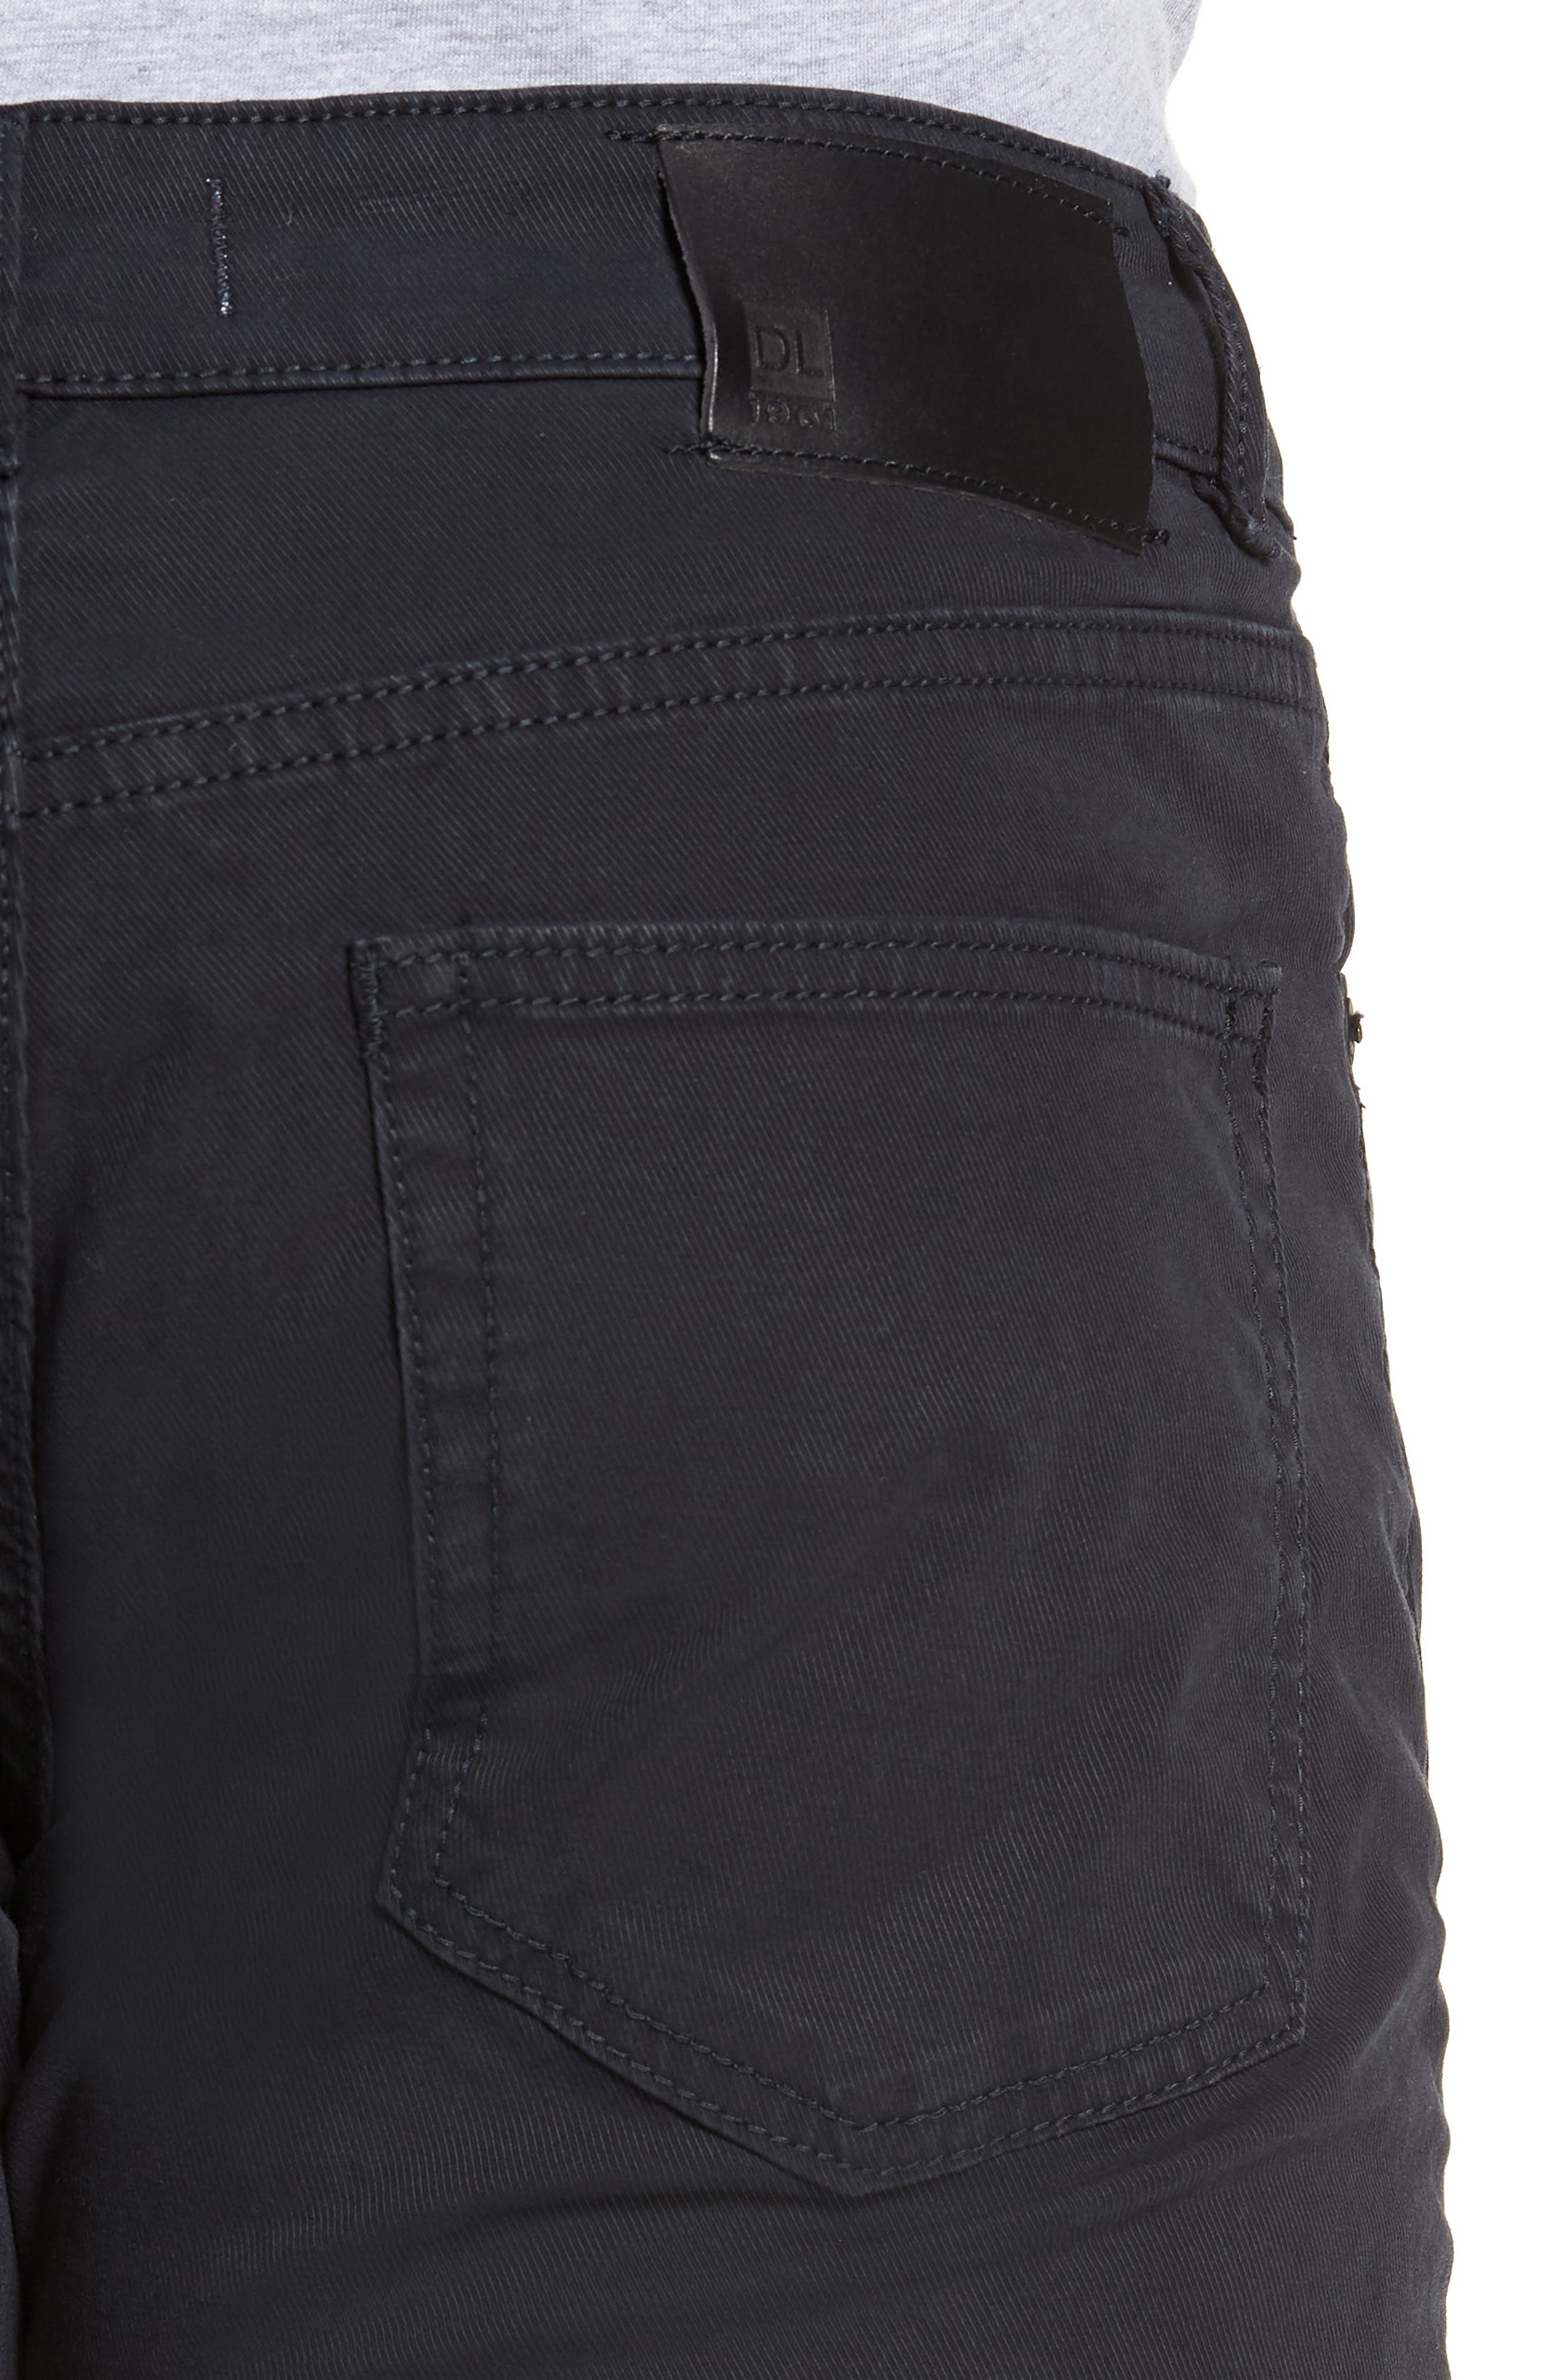 Nick Slim Fit Chino Pants,                             Alternate thumbnail 4, color,                             SHROUD